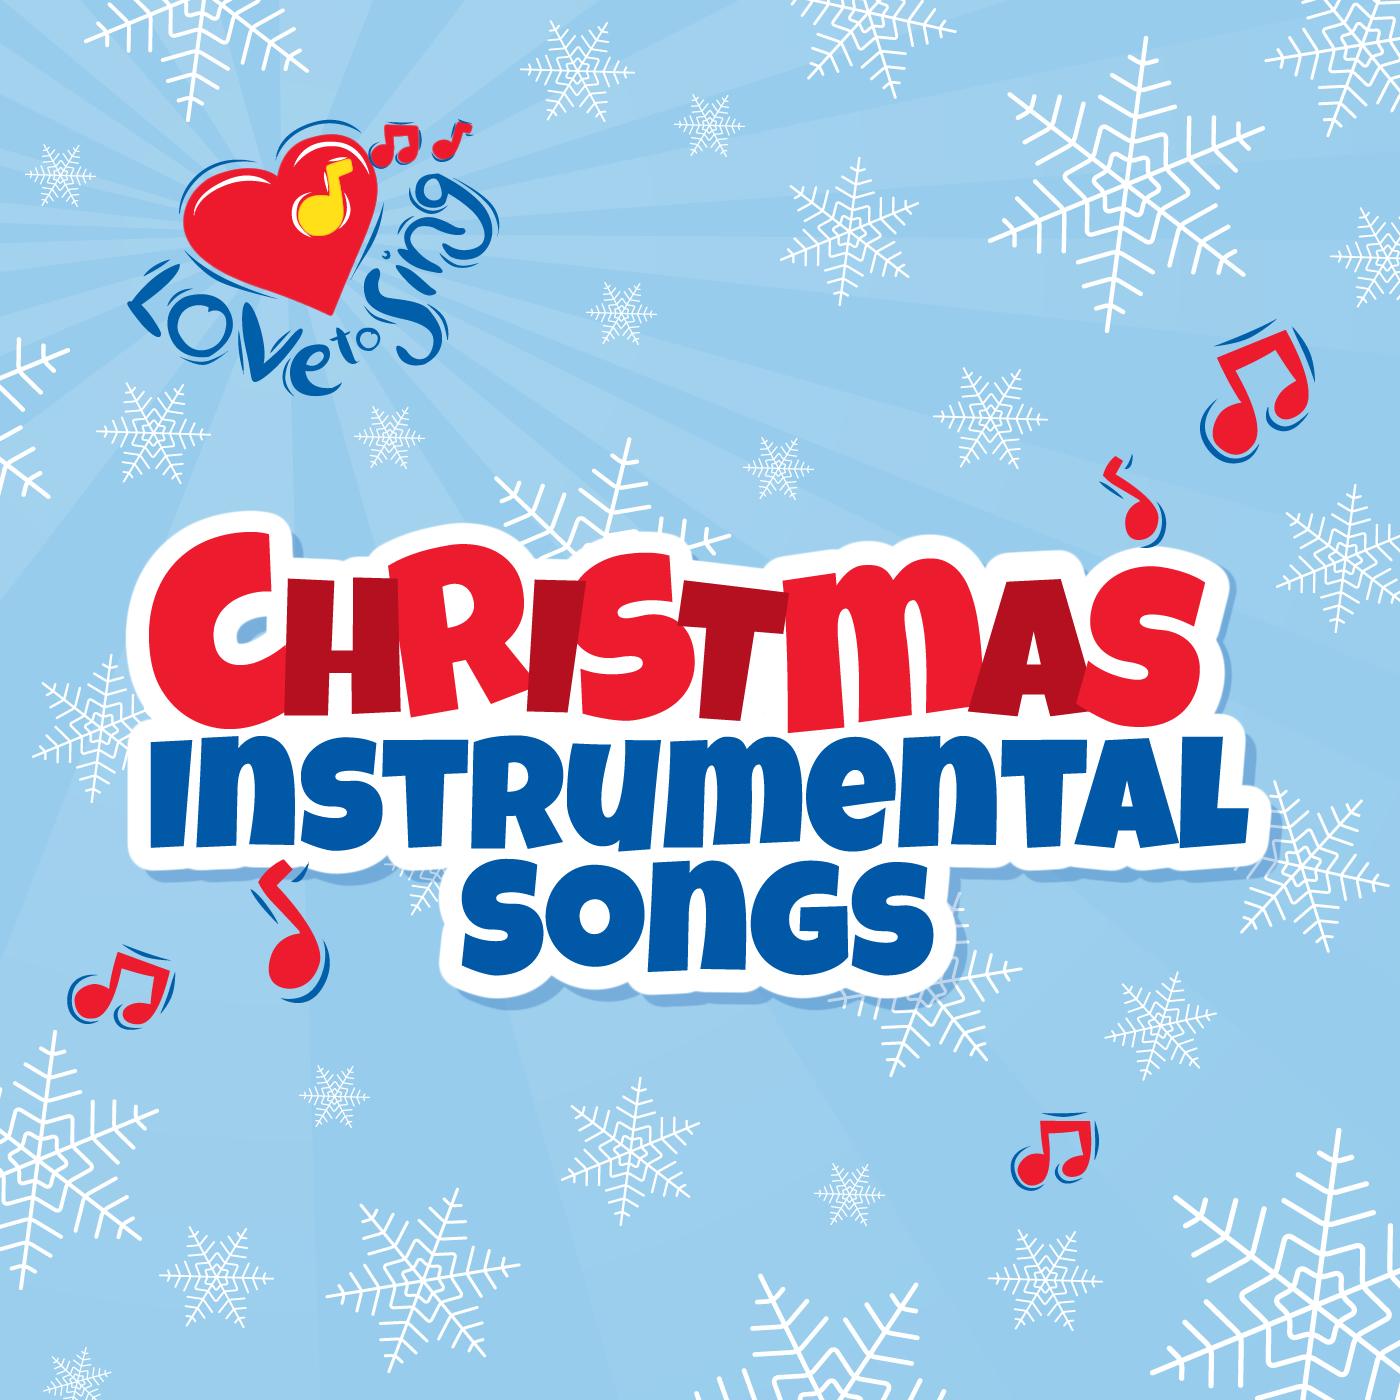 Christmas Instrumental.Christmas Instrumental Songs Carols Download Xmas Album